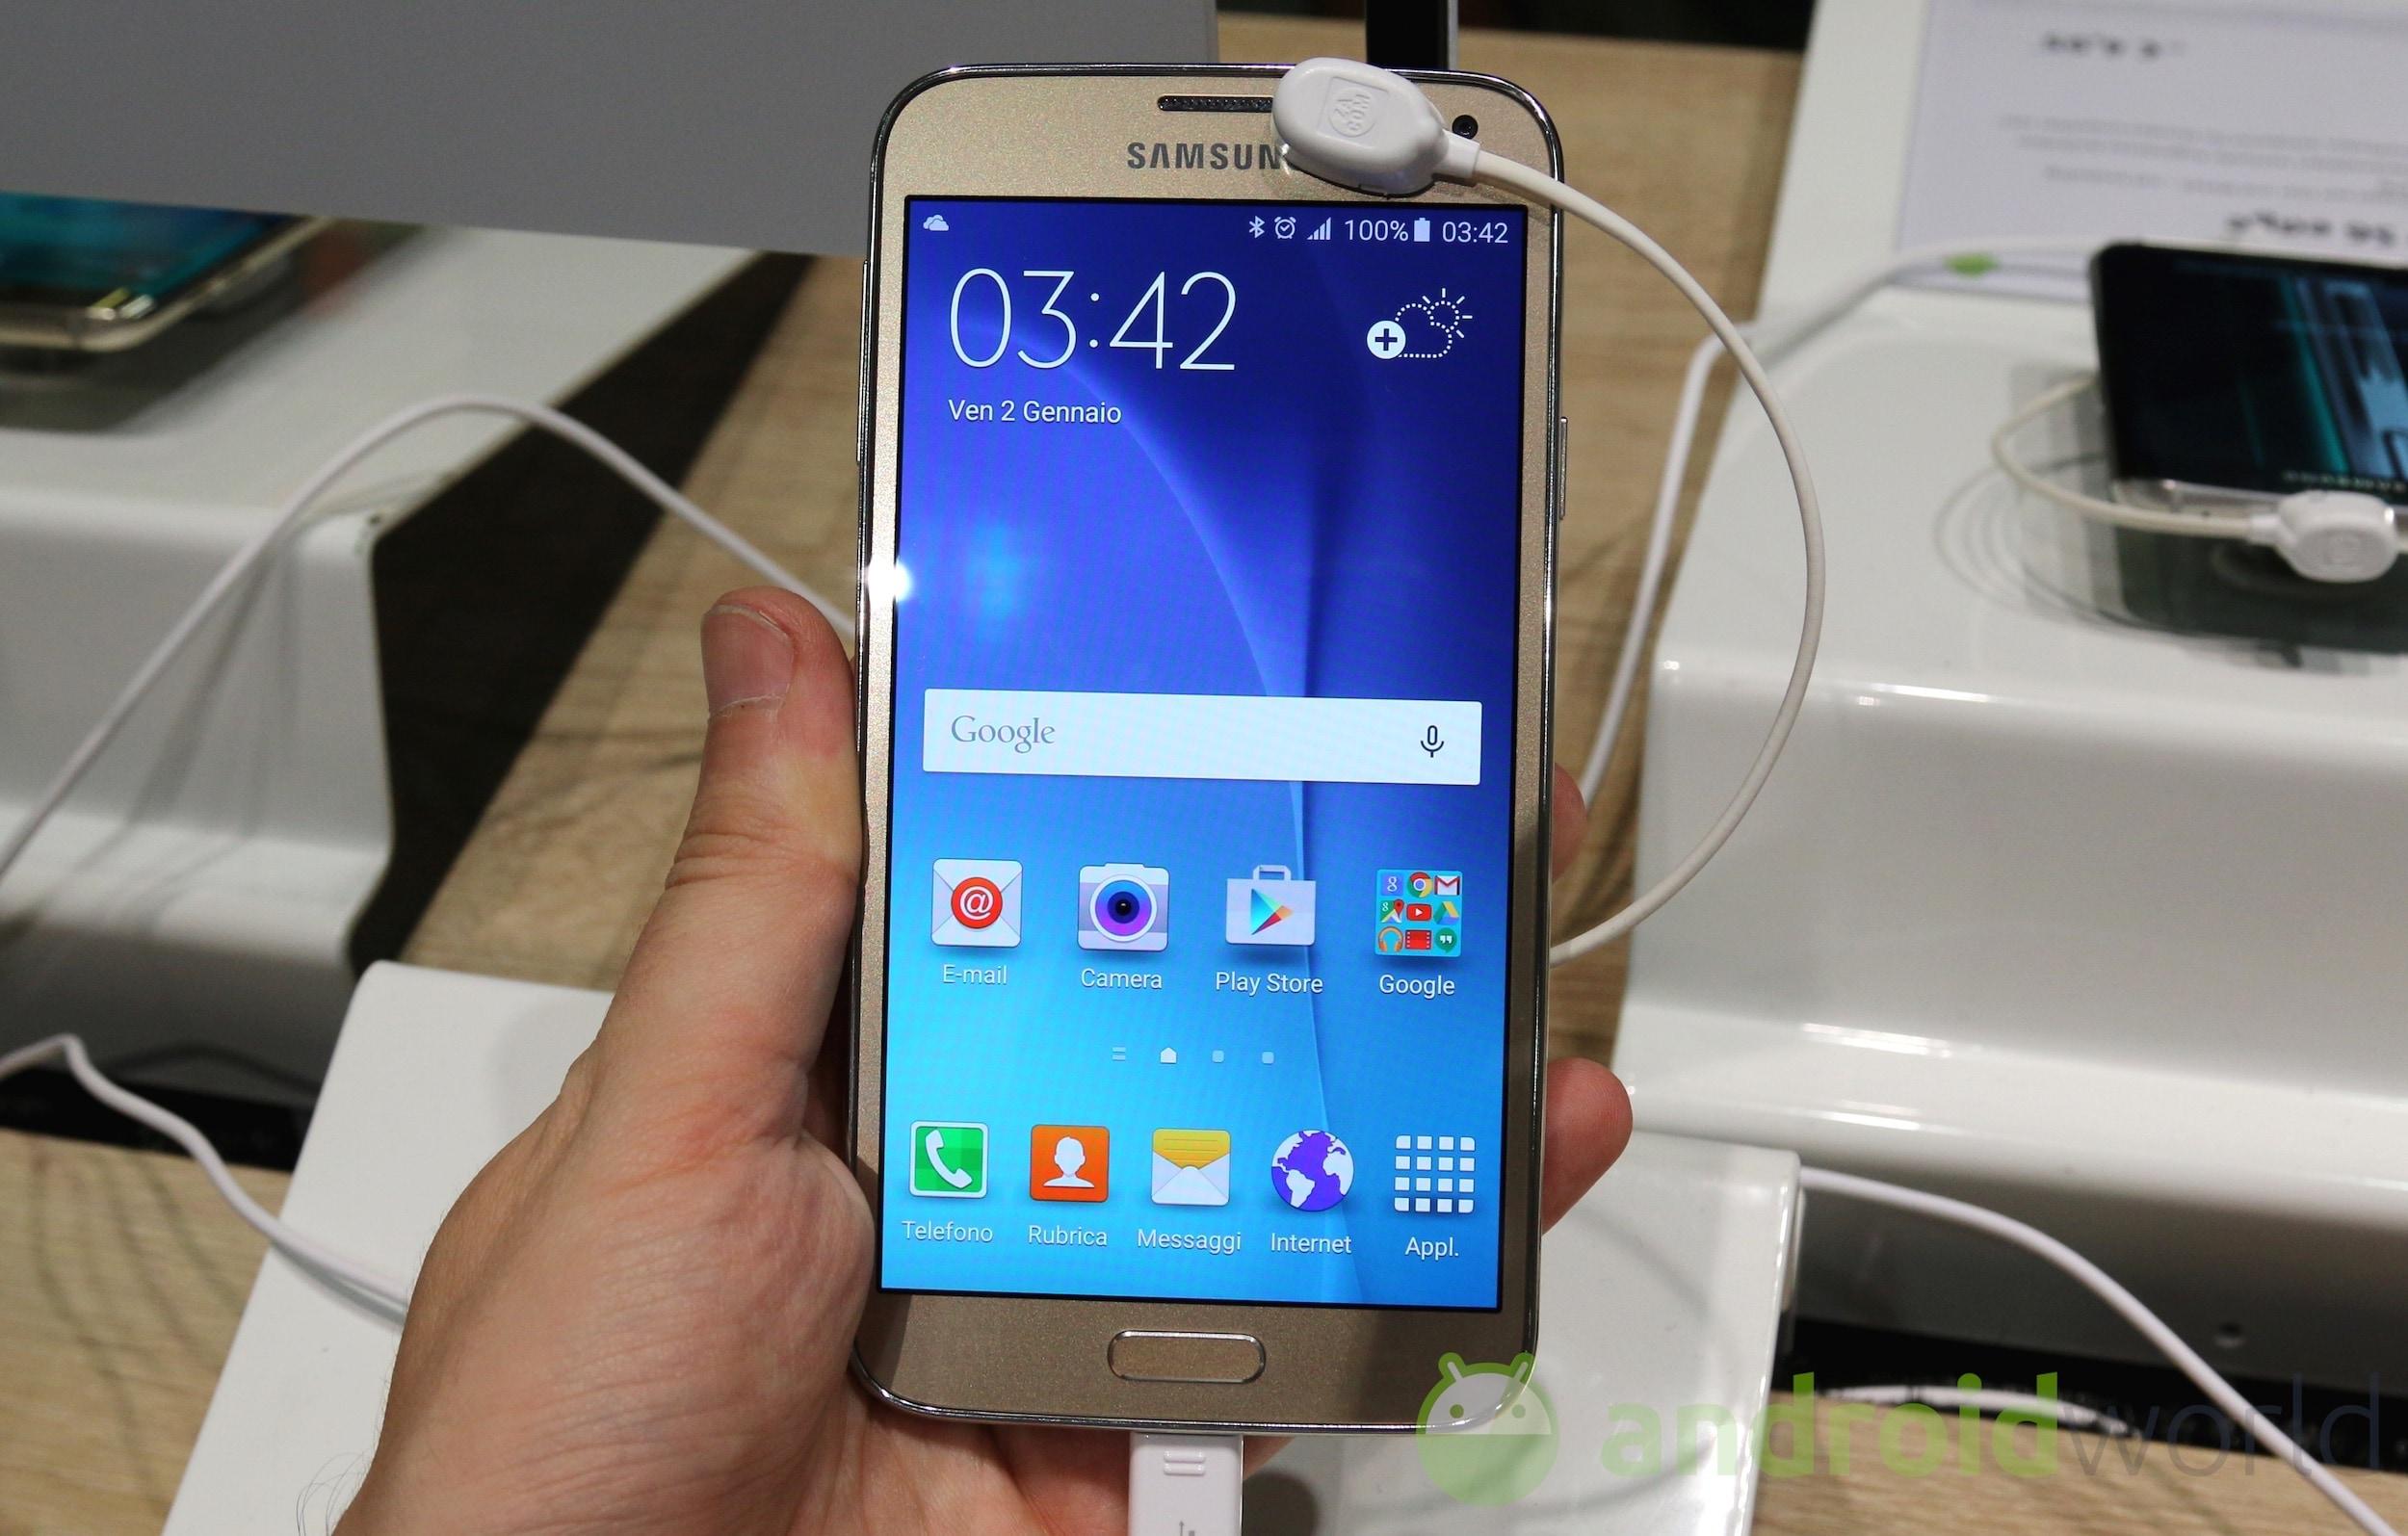 Samsung Galaxy S5 Neo 1 2